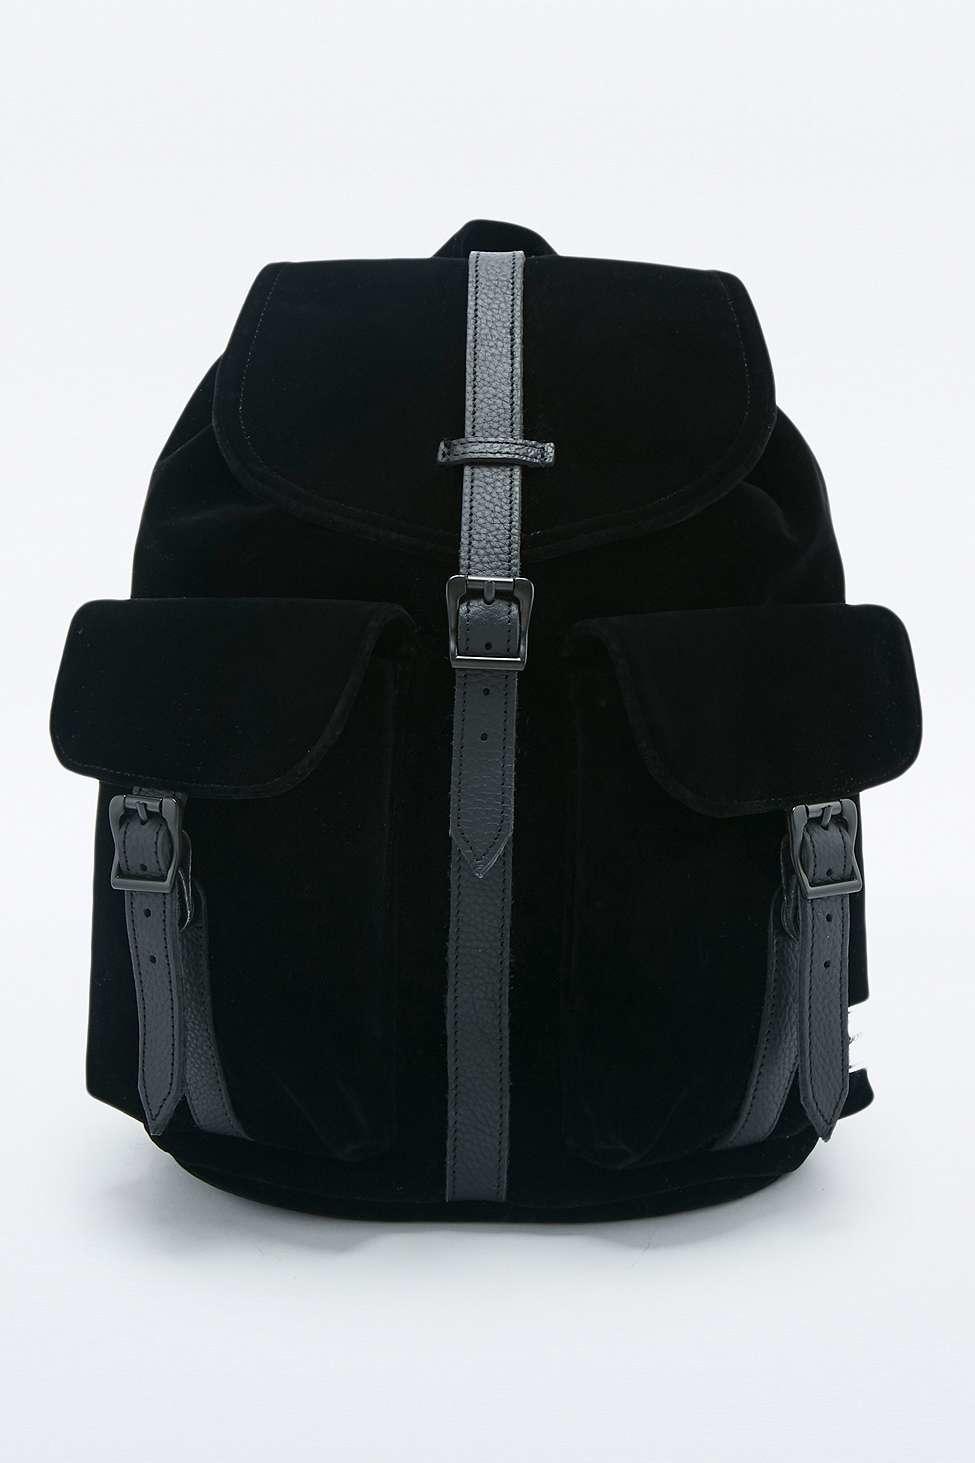 b4931dd4a75 Herschel Supply Co. Dawson Black Velvet Backpack in Black - Lyst